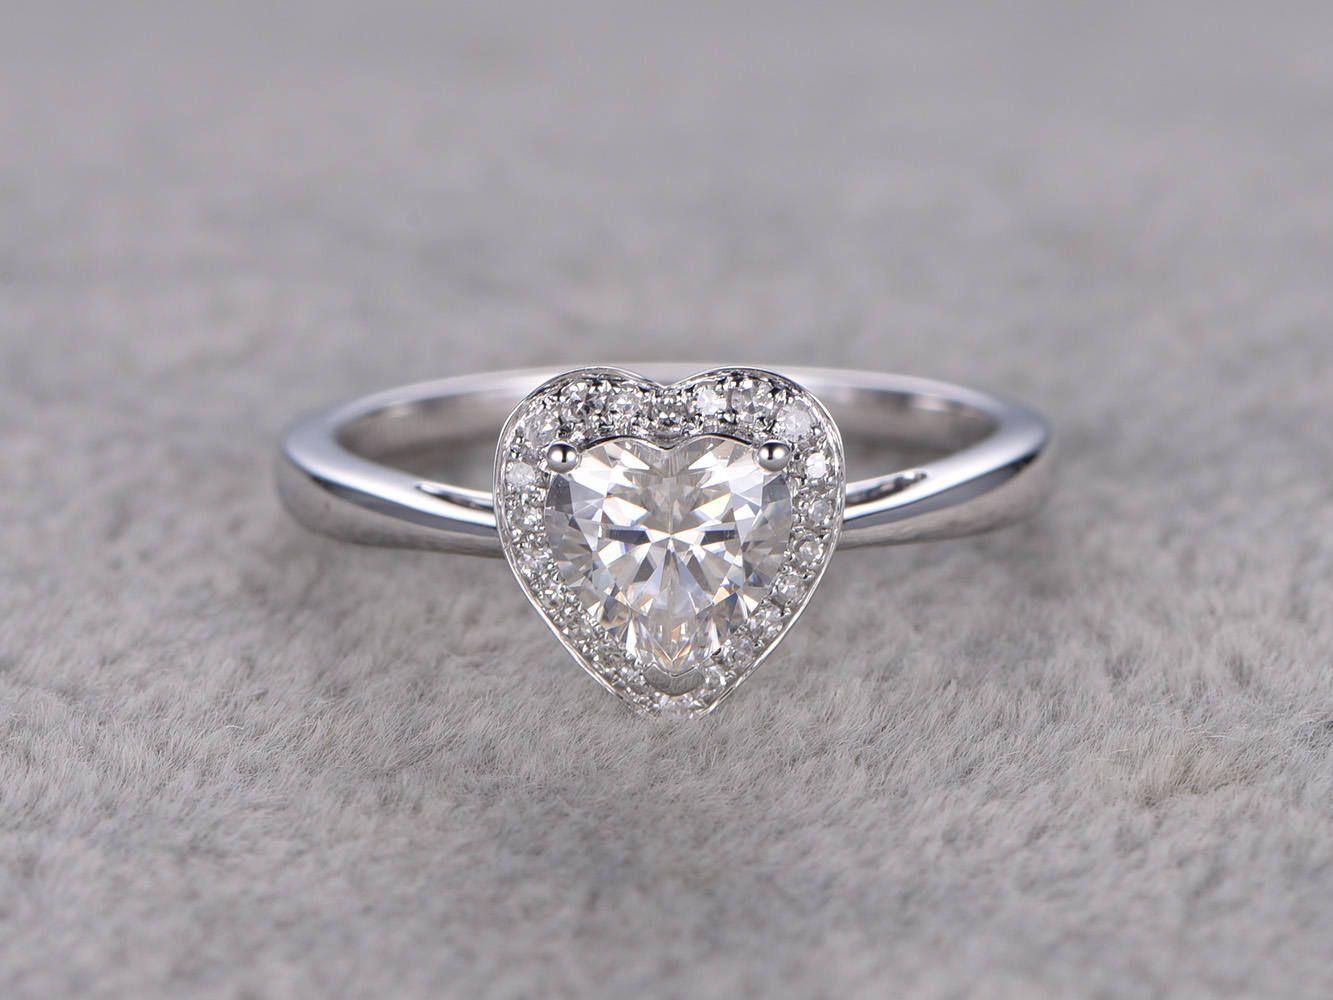 Ct brilliant moissanite engagement ring white goldplain gold band